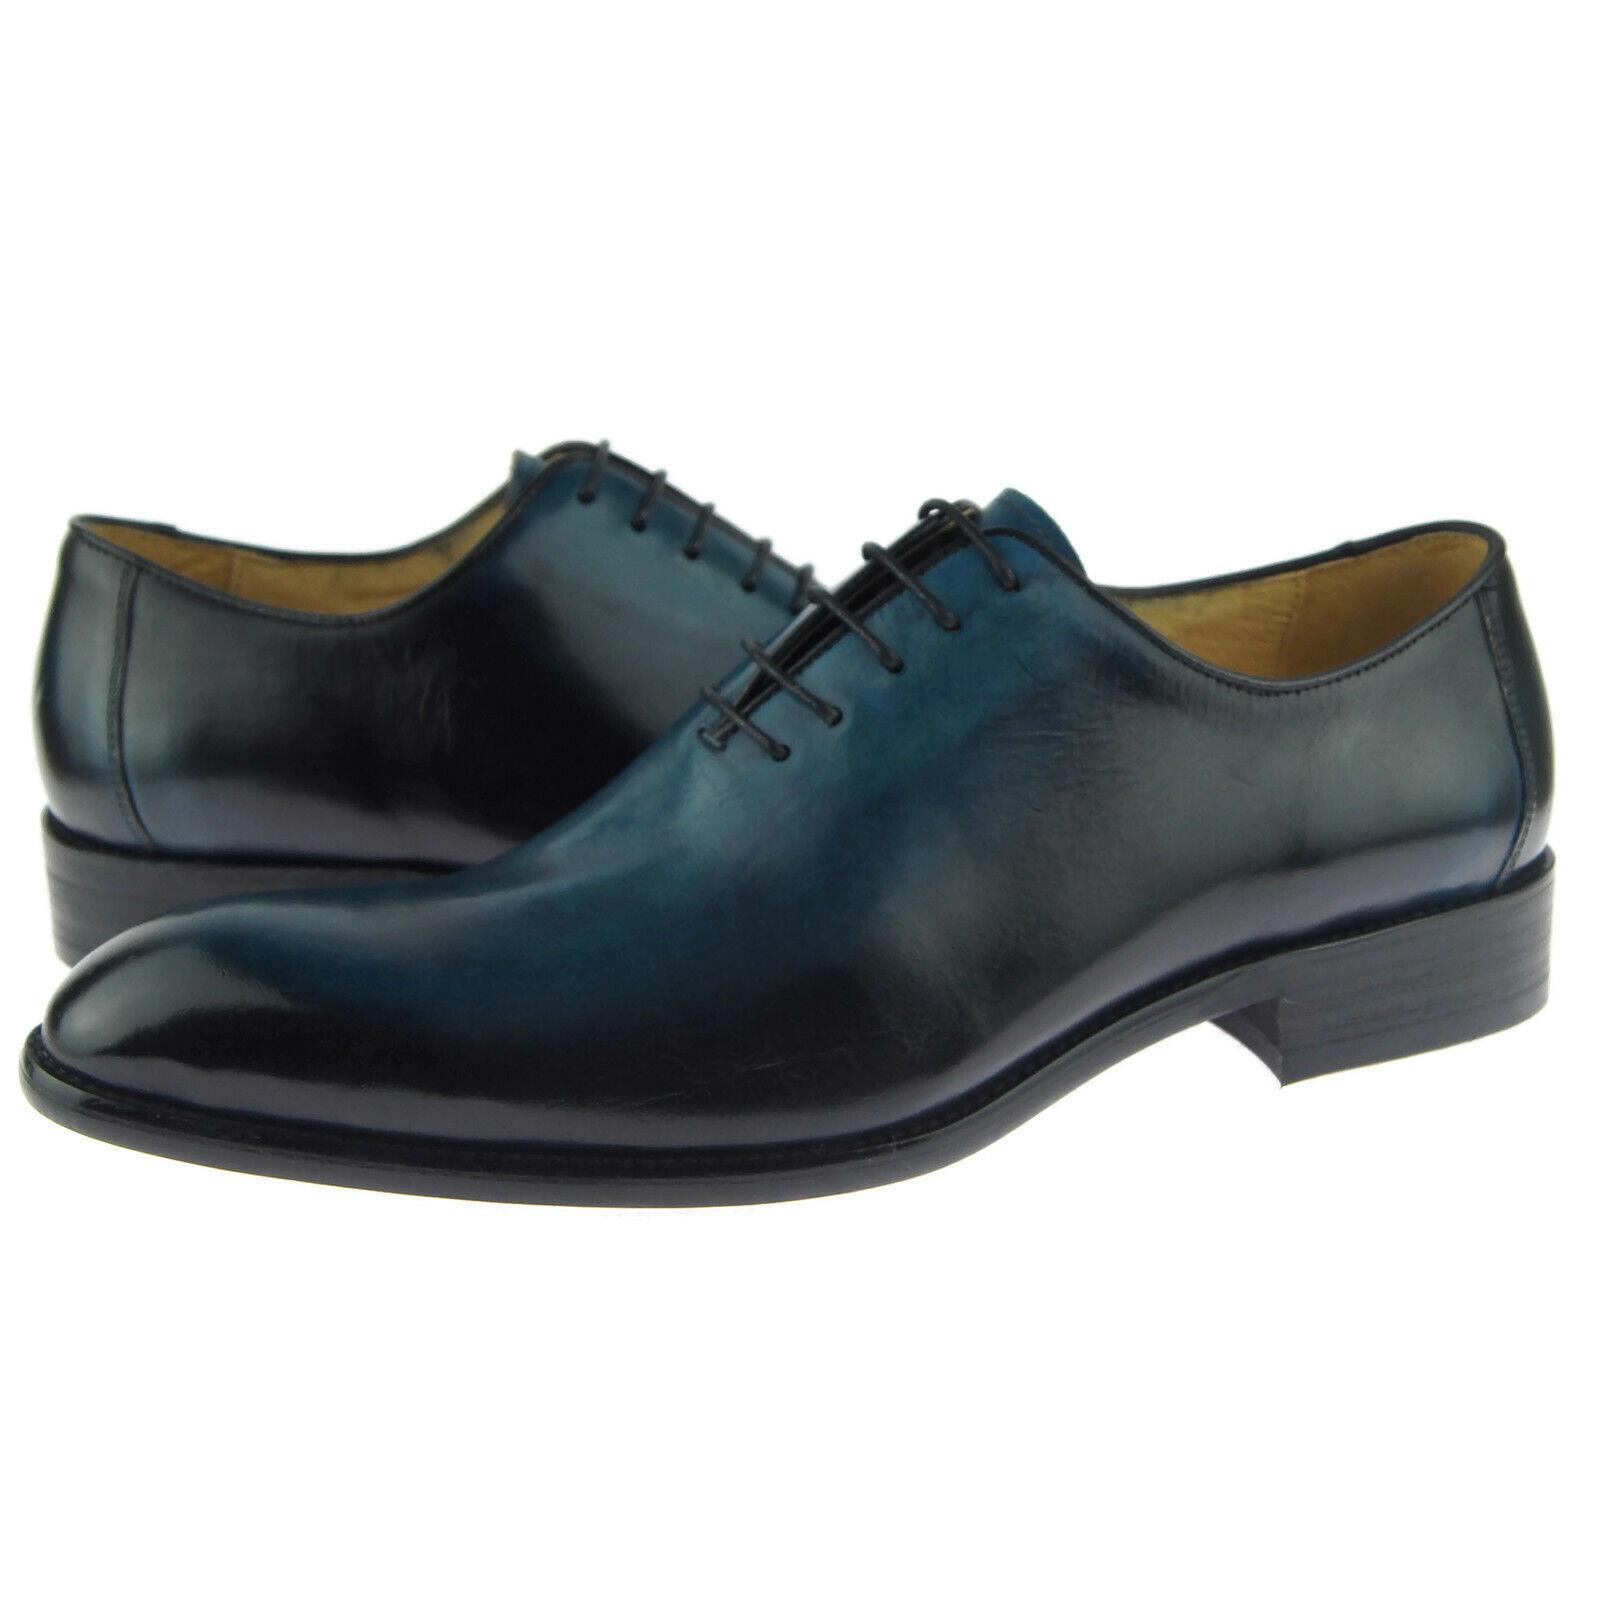 Carrucci  Burnished Wholecut Oxford, Men's Dress Leather scarpe, blu  vendite dirette della fabbrica